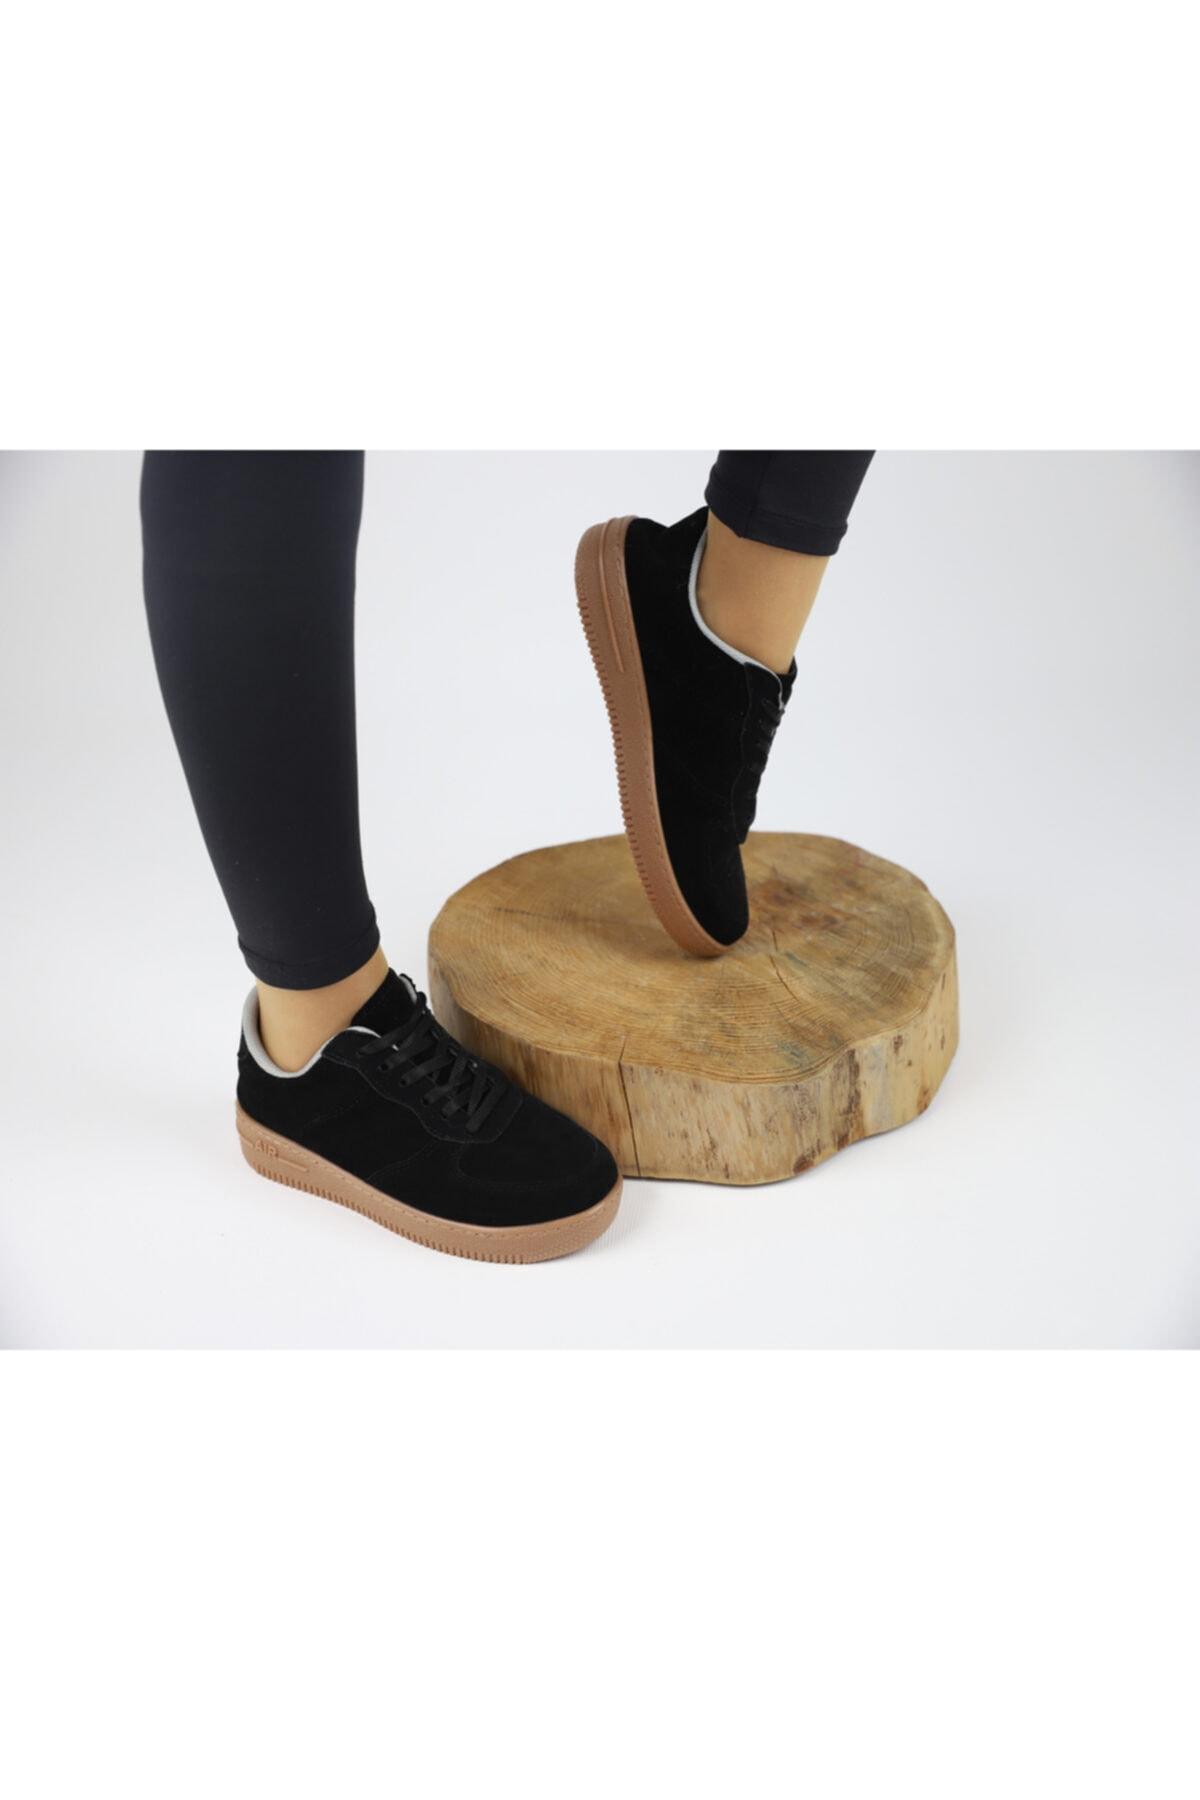 MSshopingg Kadın Siyah Casual Ayakkabı 2